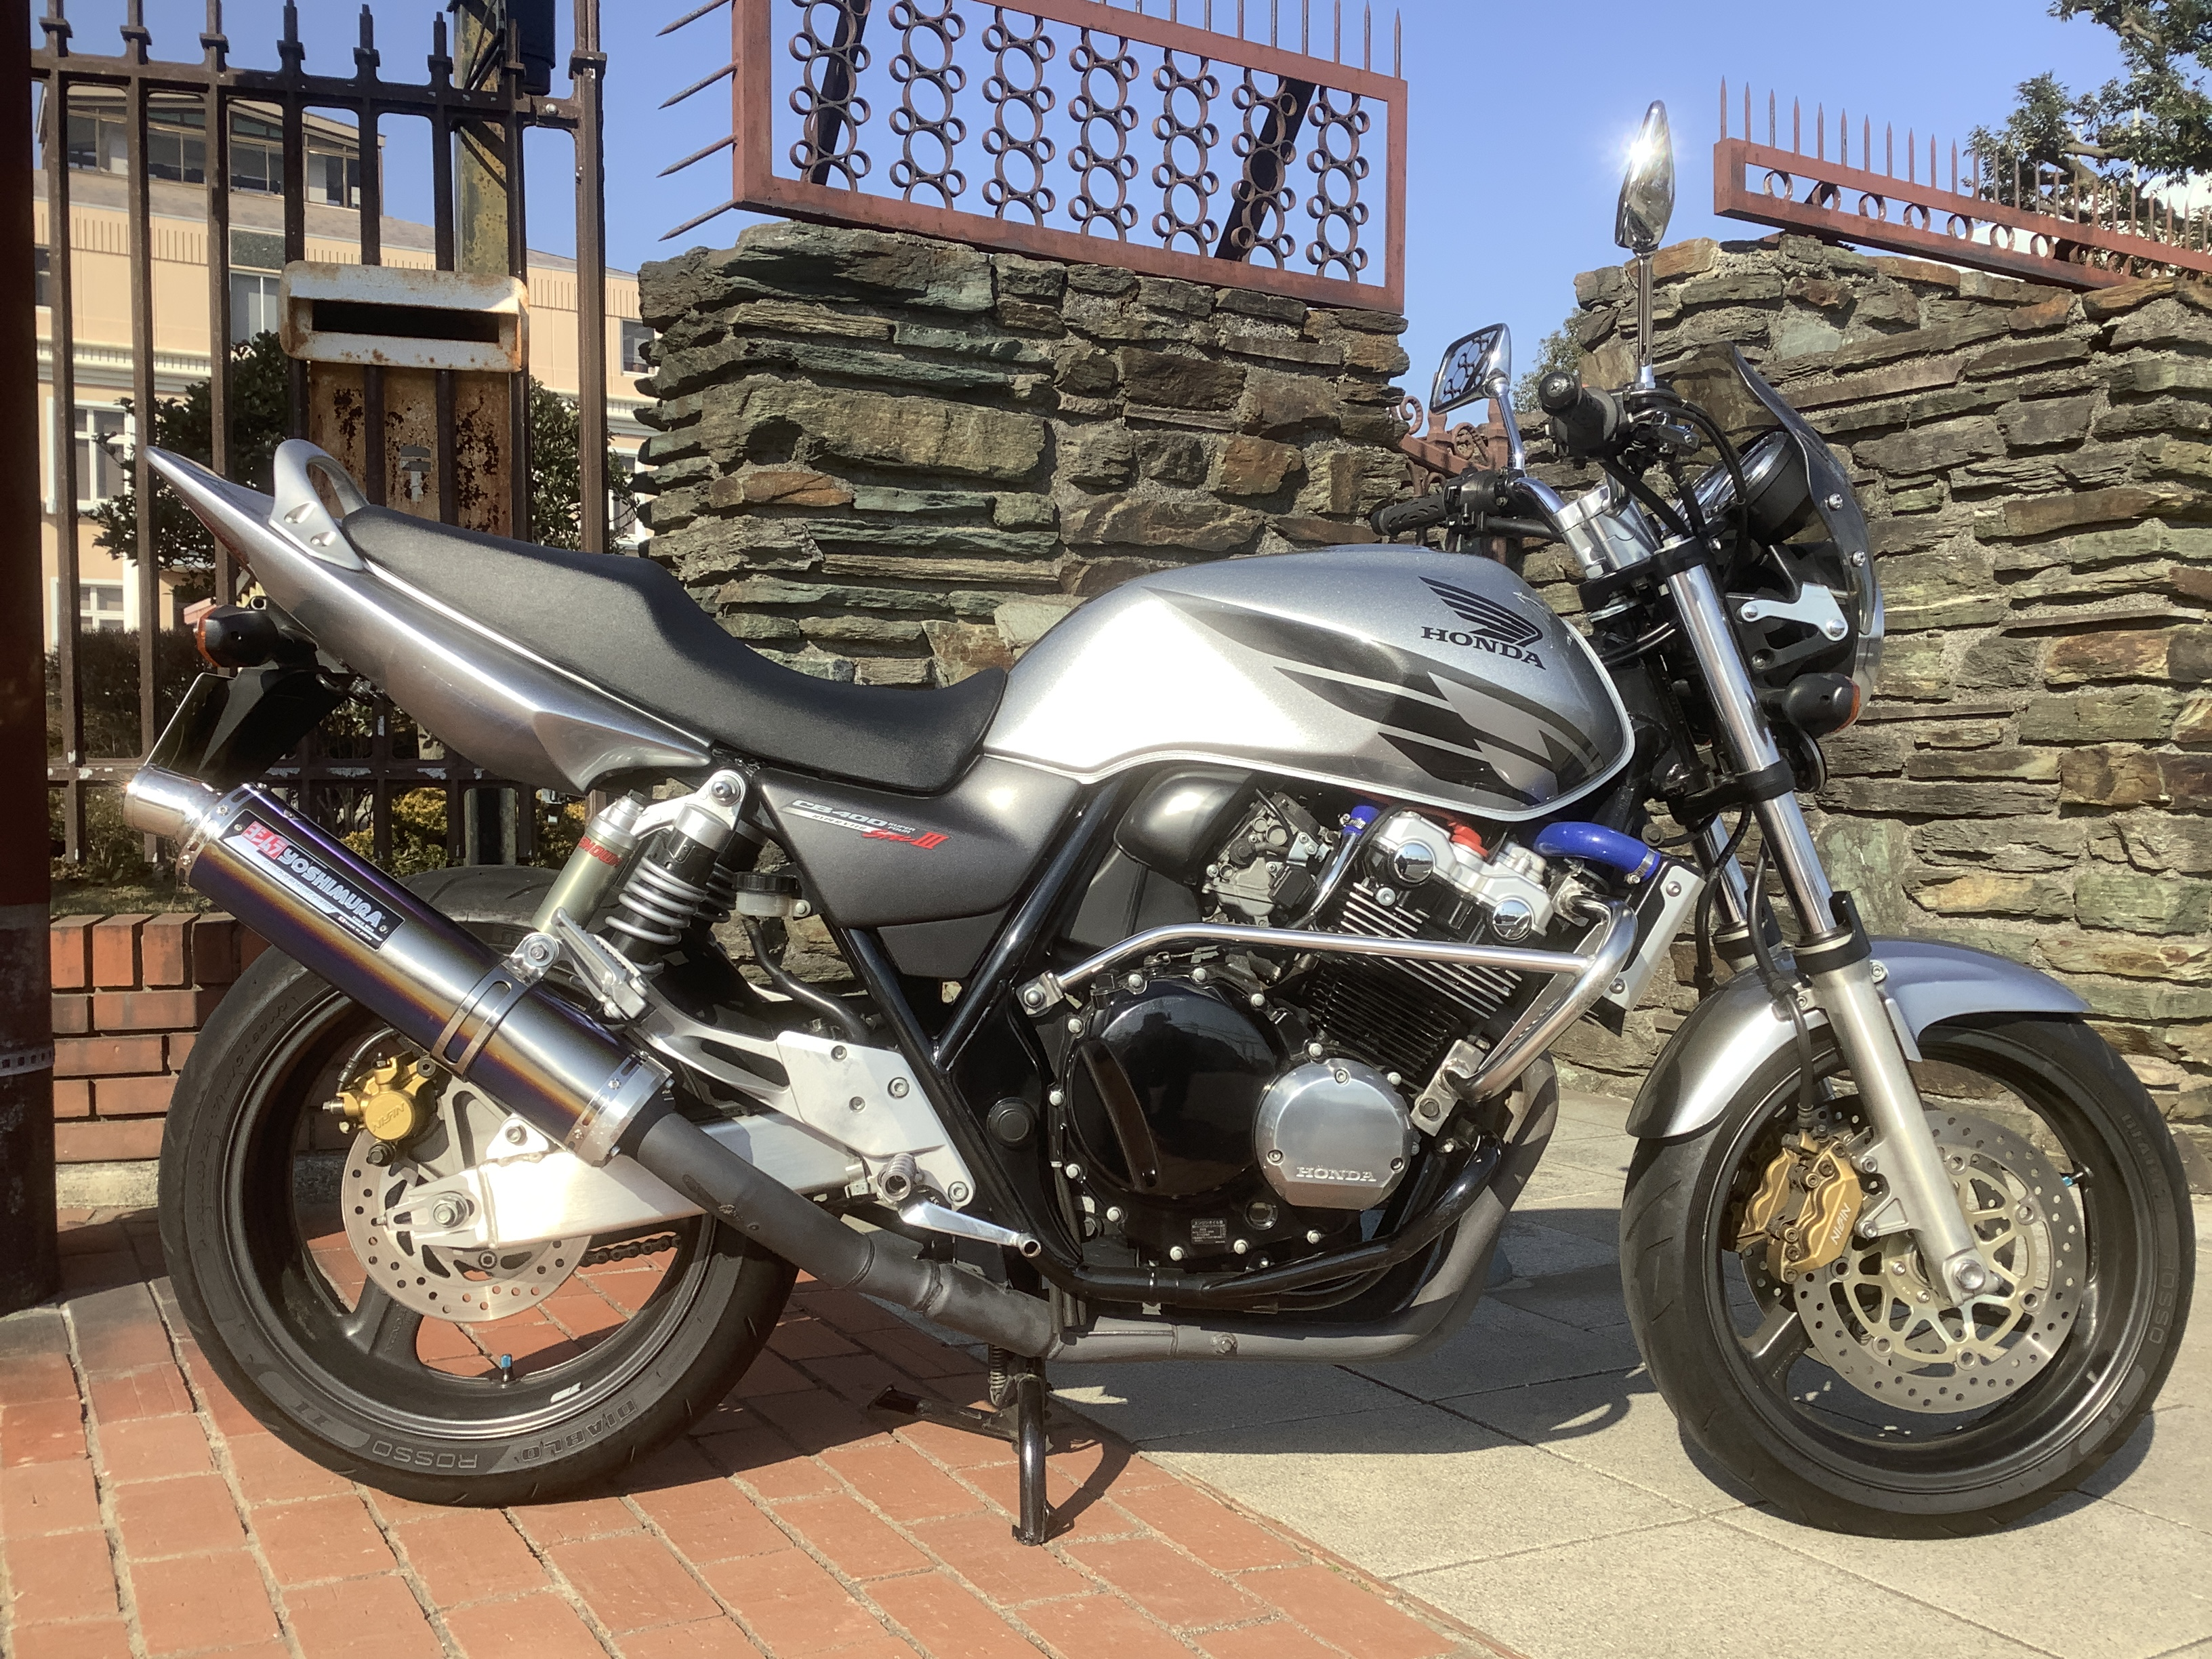 CB400Vtec-3(HN-00)銀 - 【公式】レンタルバイクのベストBike® 目黒駅前